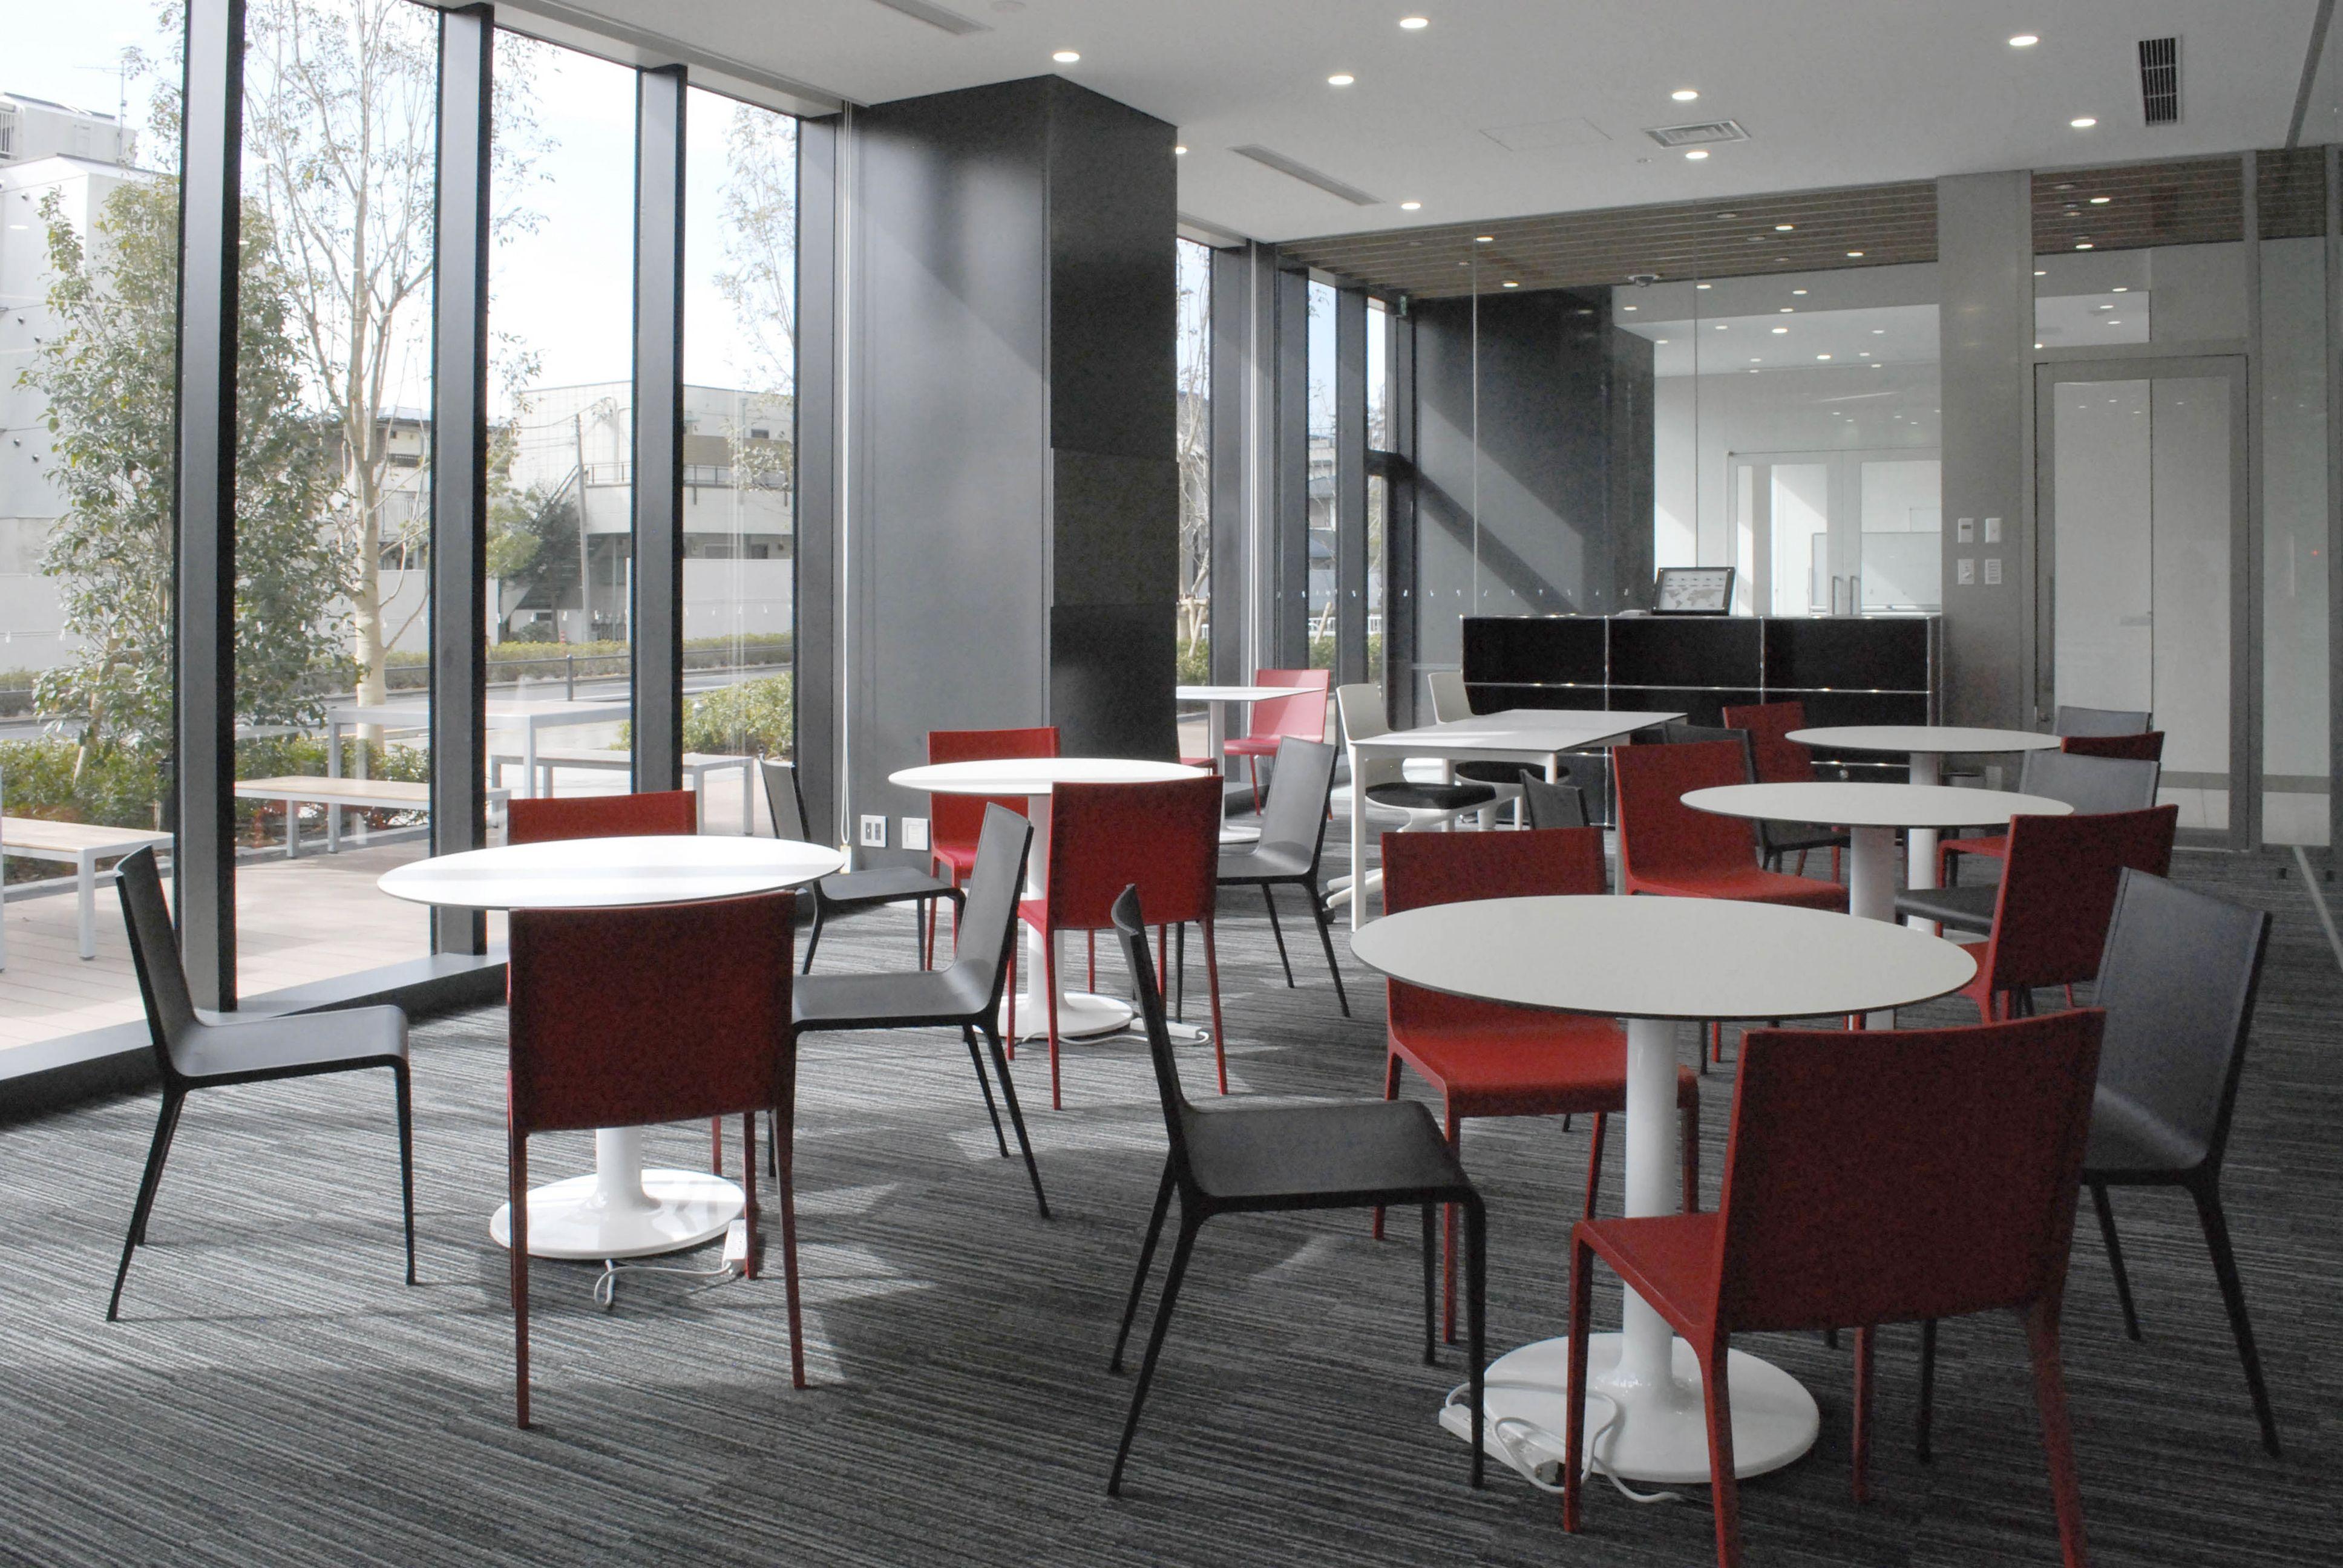 Bikappa chair designed by Bartoli Design #chair #bartoli #design #office